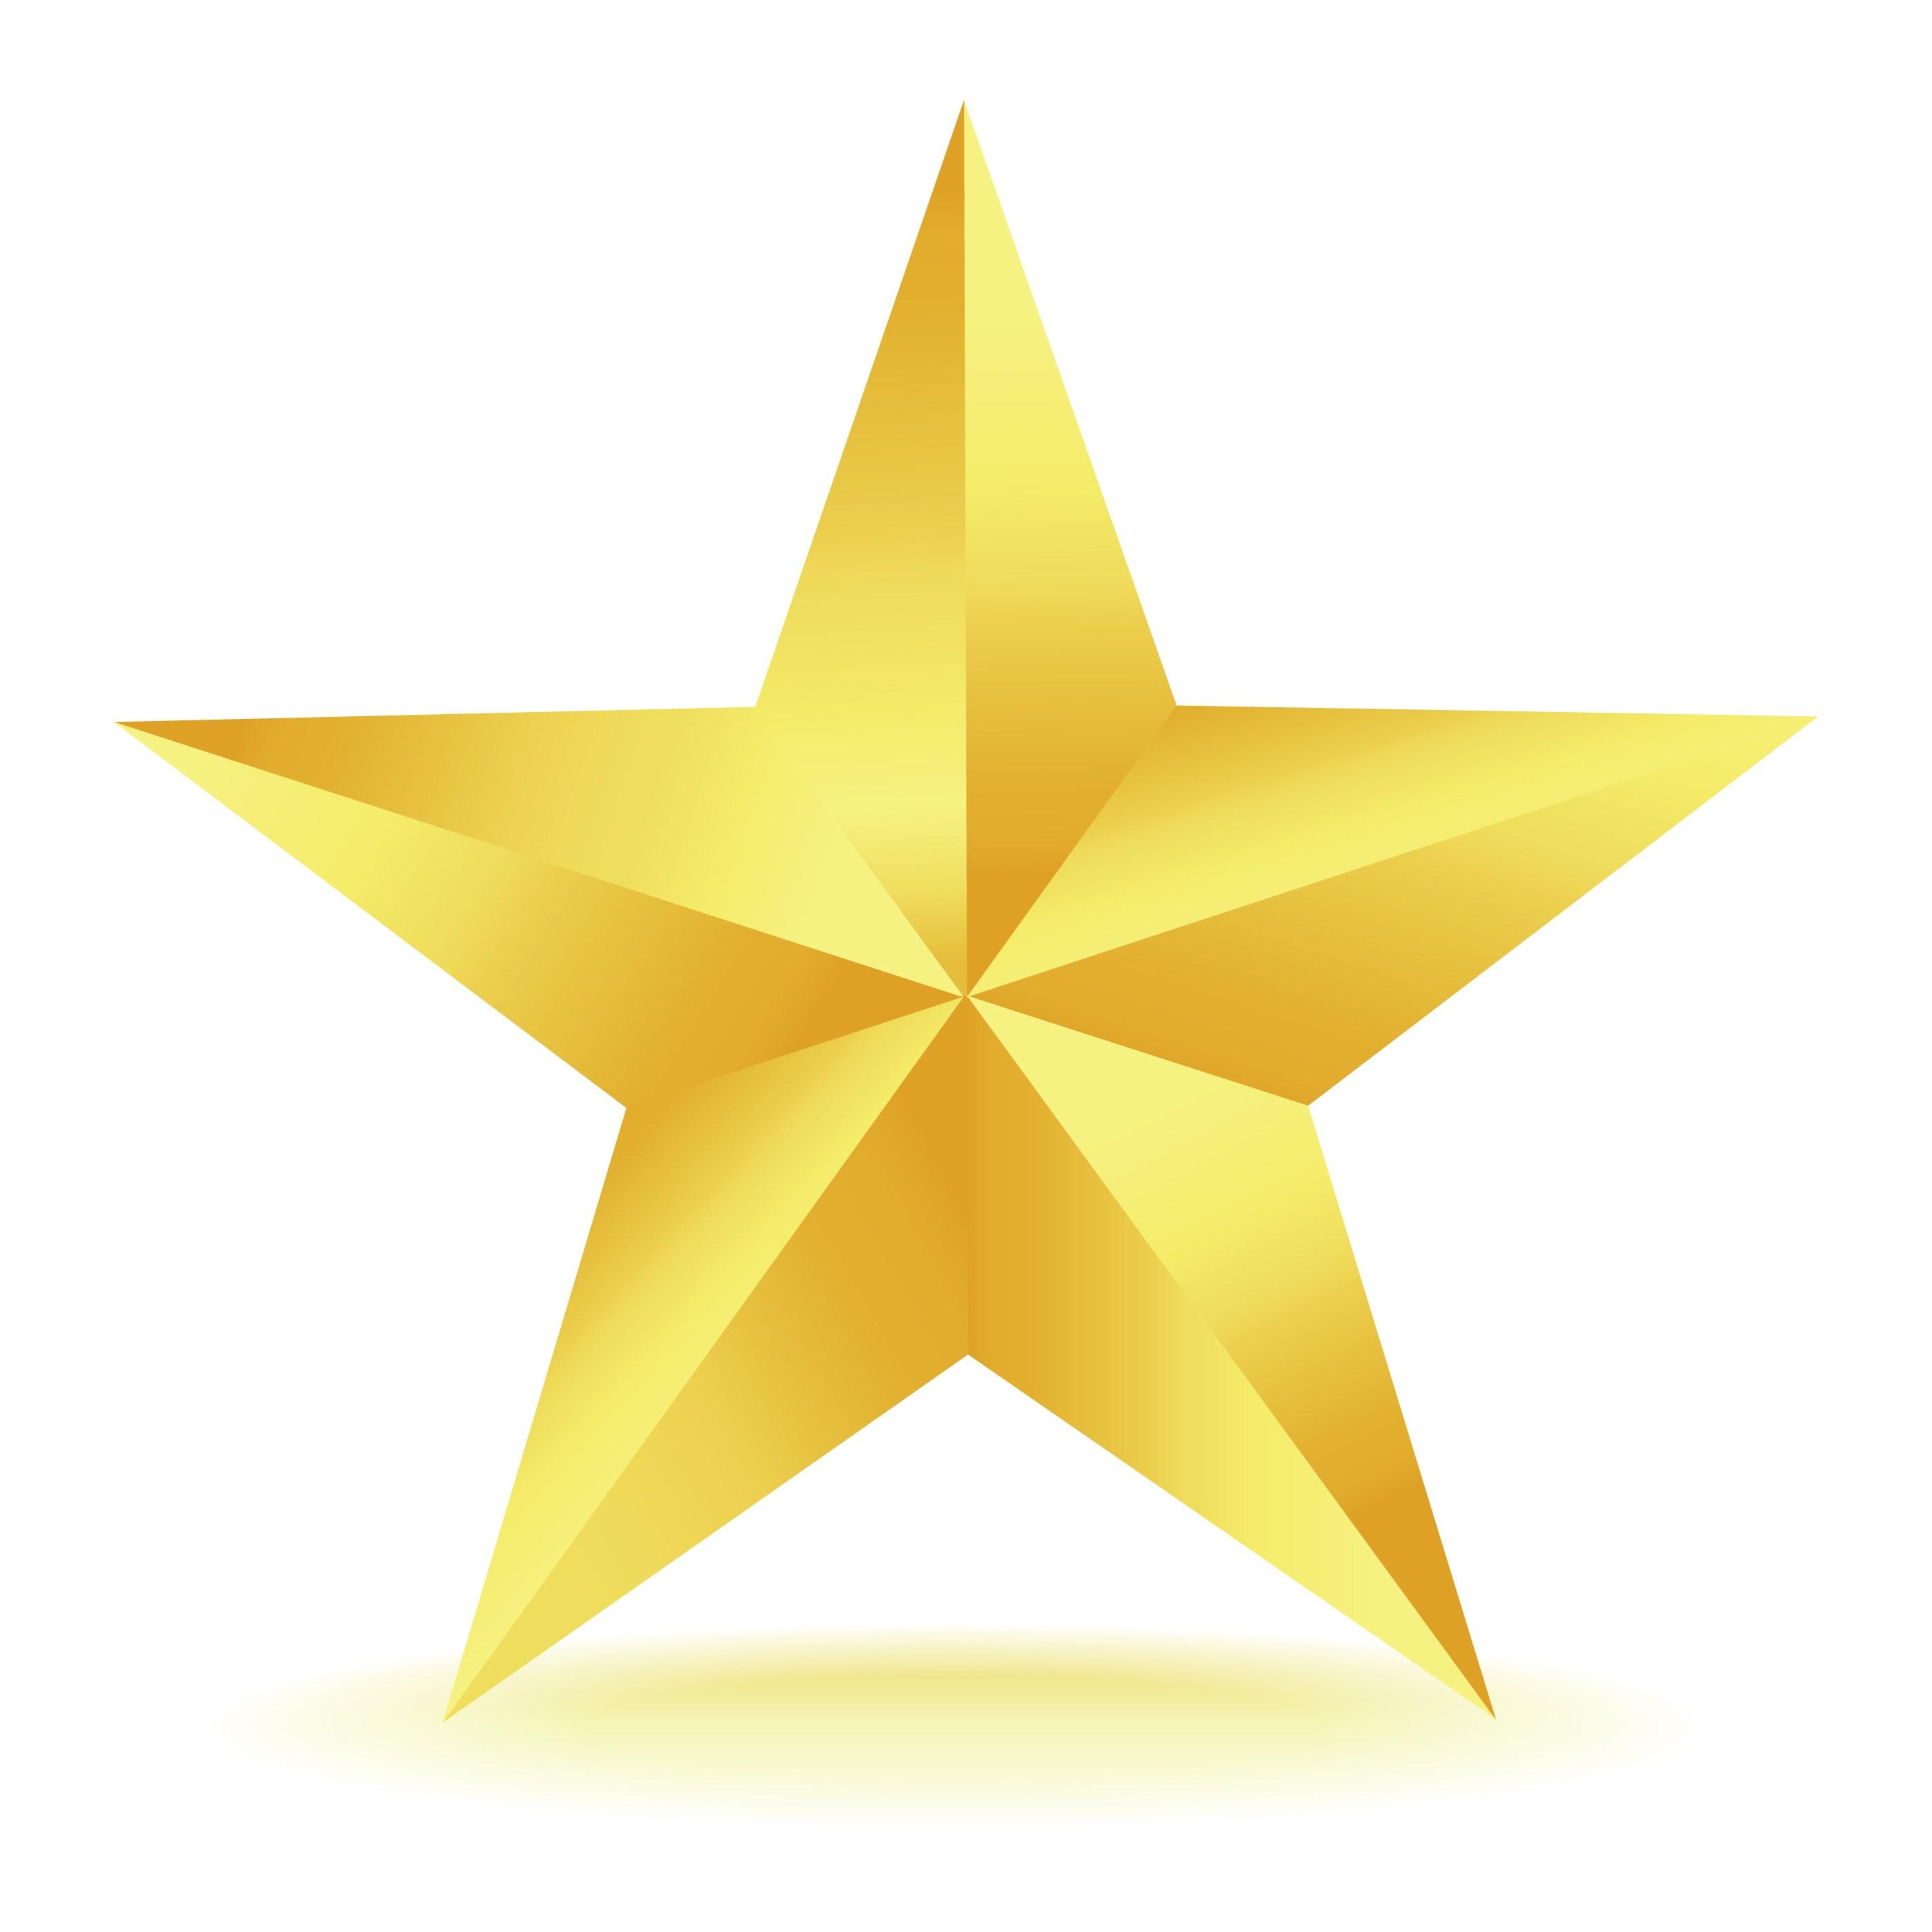 Star clipart free download 2 » Clipart Portal.